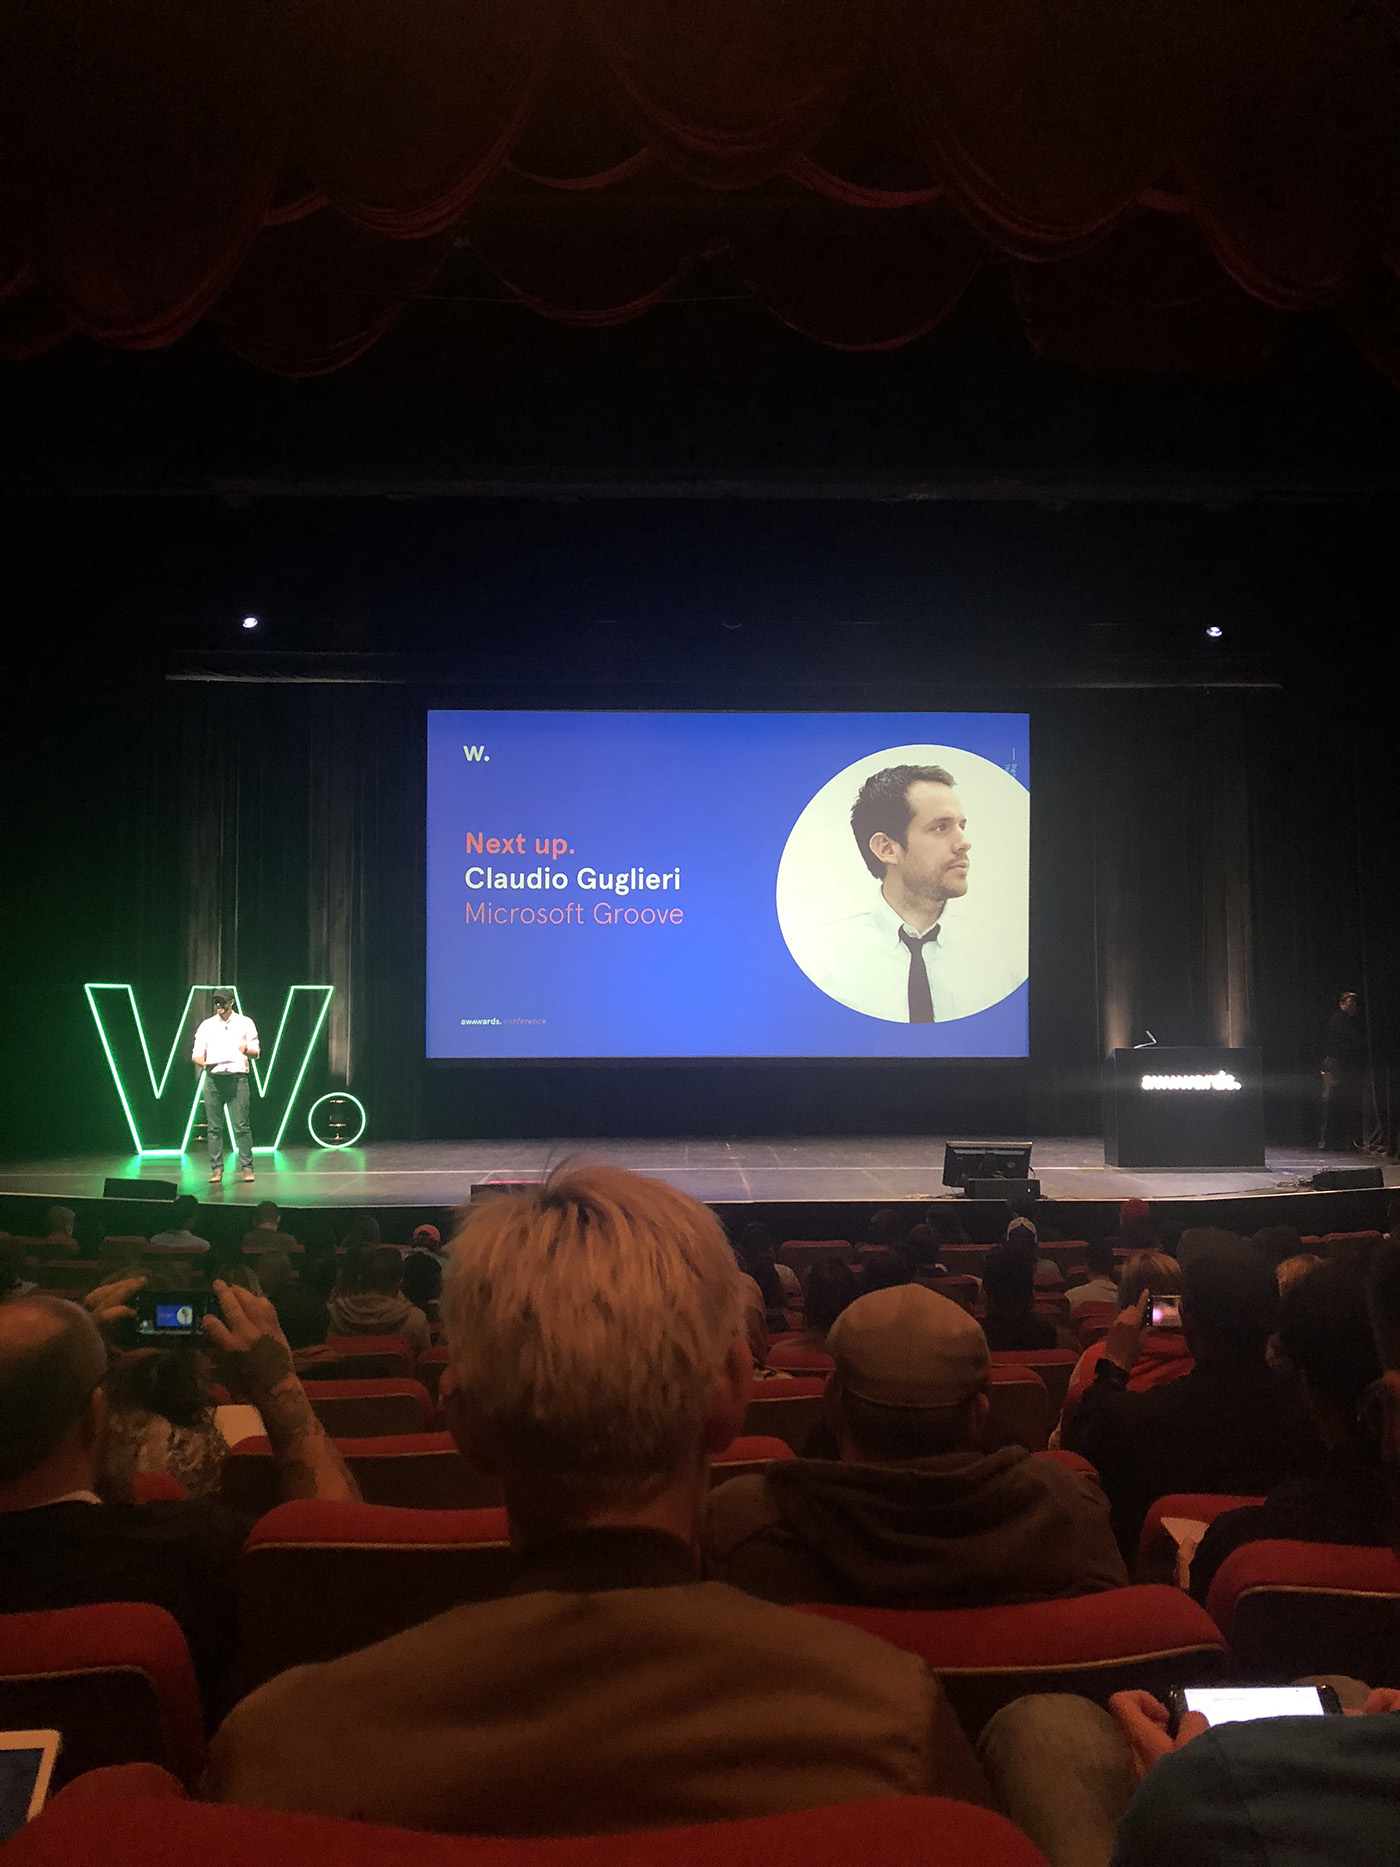 Prezentace Claudio Guglieri, Art directora z Microsoftu na téma fluent design